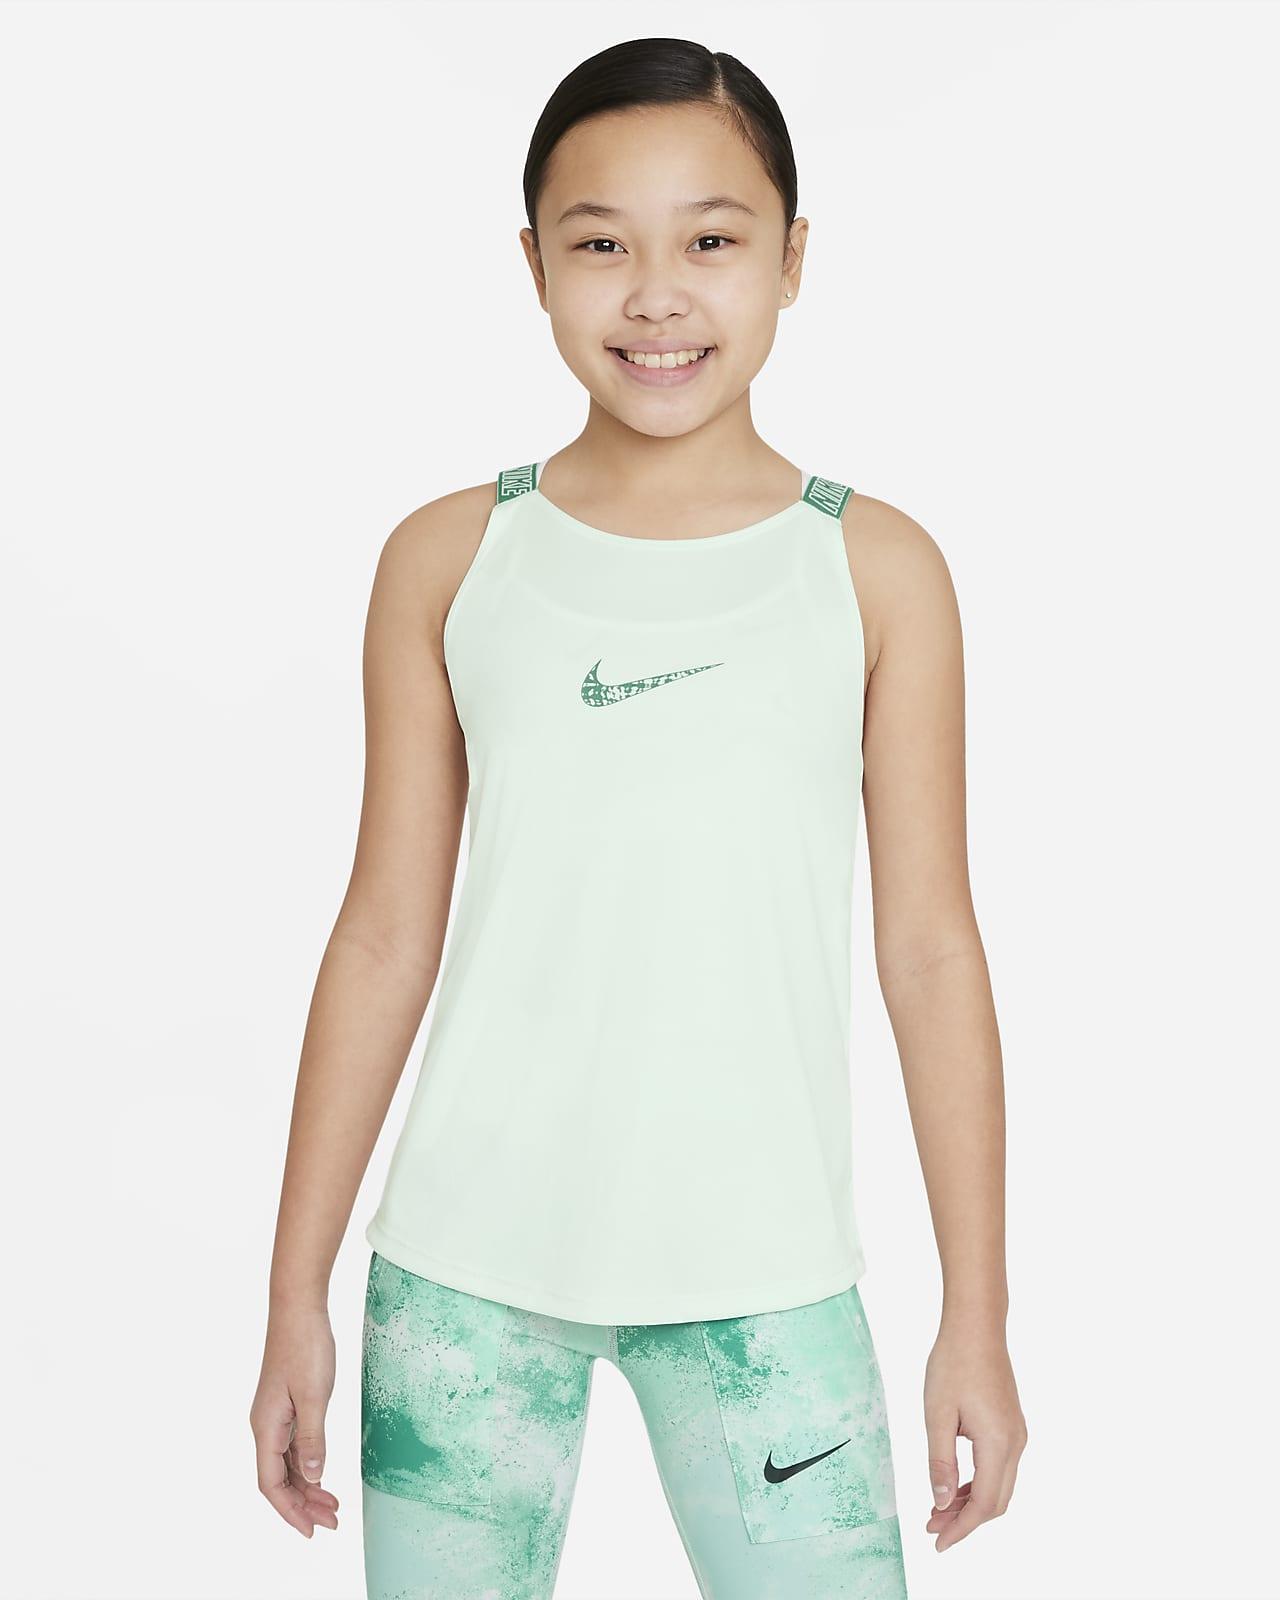 Nike Dri-FIT Elastika Genç Çocuk (Kız) Antrenman Atleti